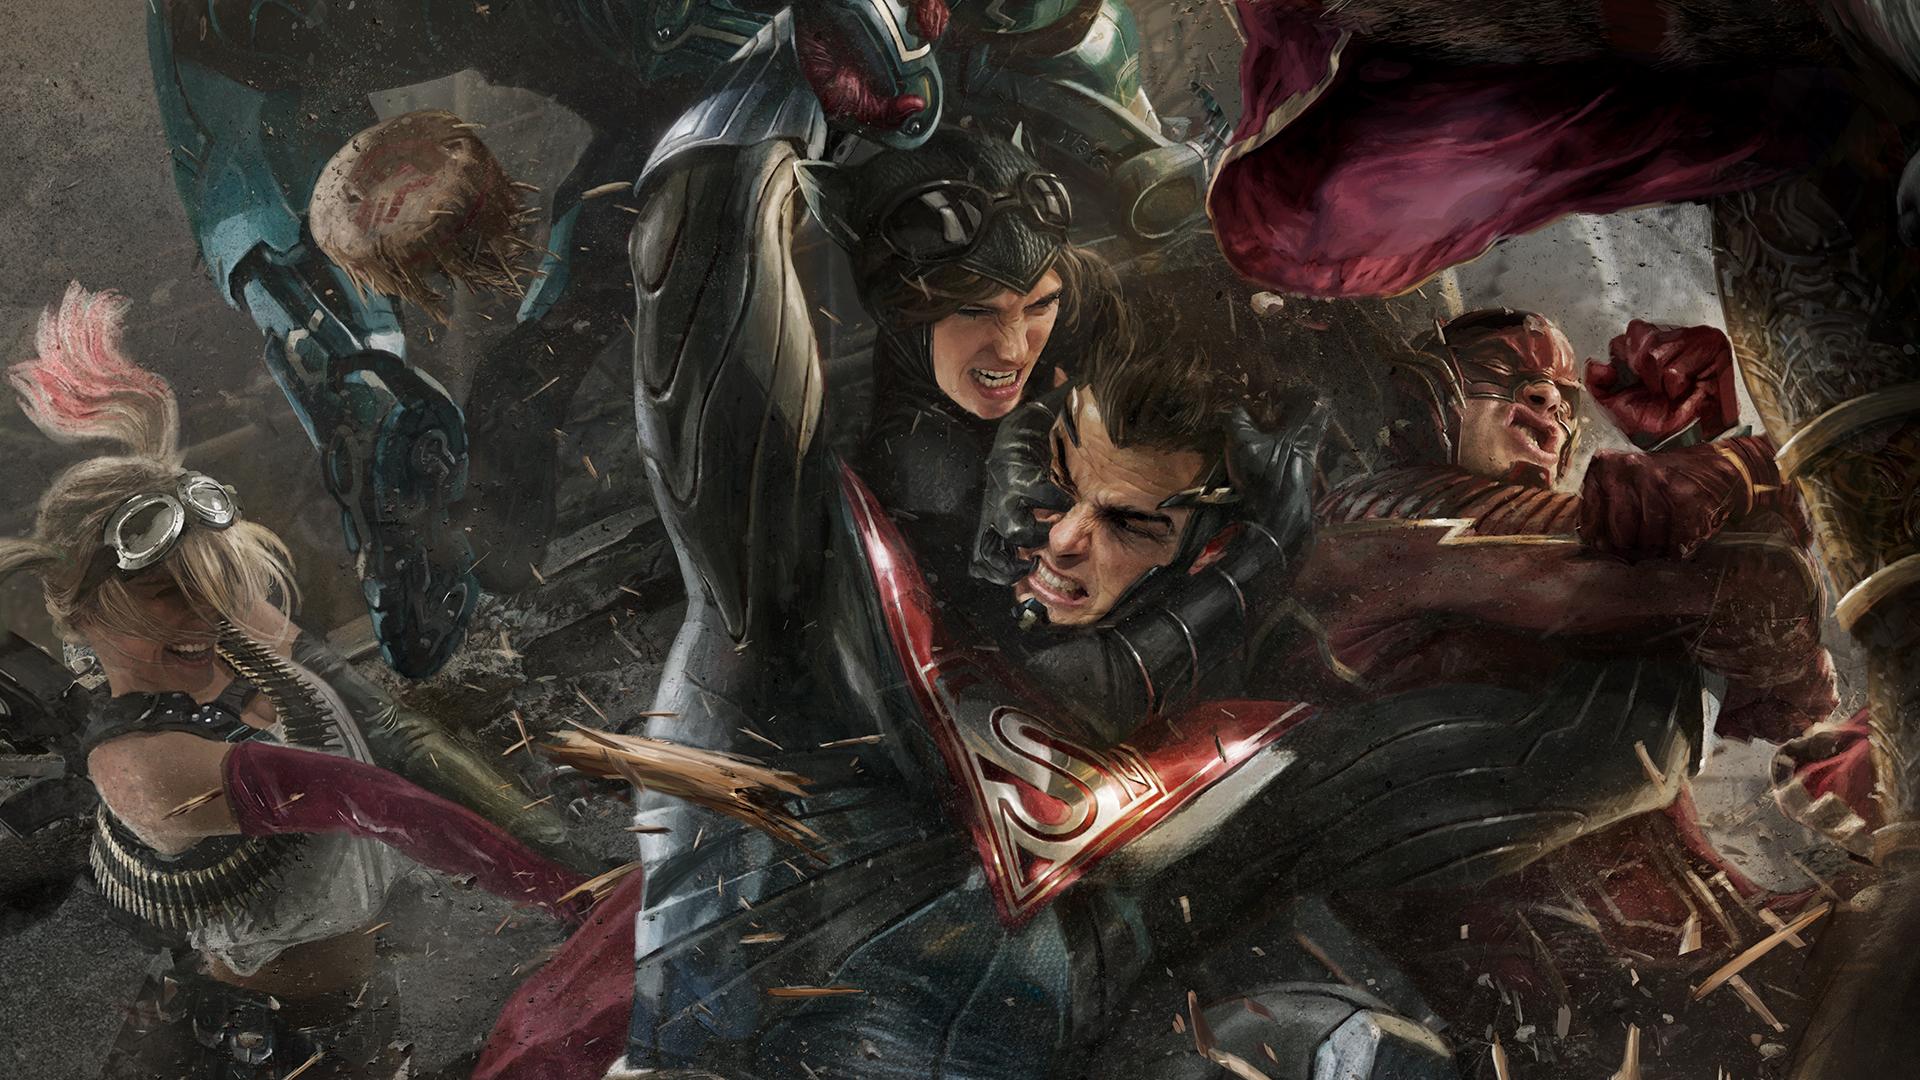 Injustice 2 Superman Hd Games 4k Wallpapers Images: Injustice 2, HD Games, 4k Wallpapers, Images, Backgrounds